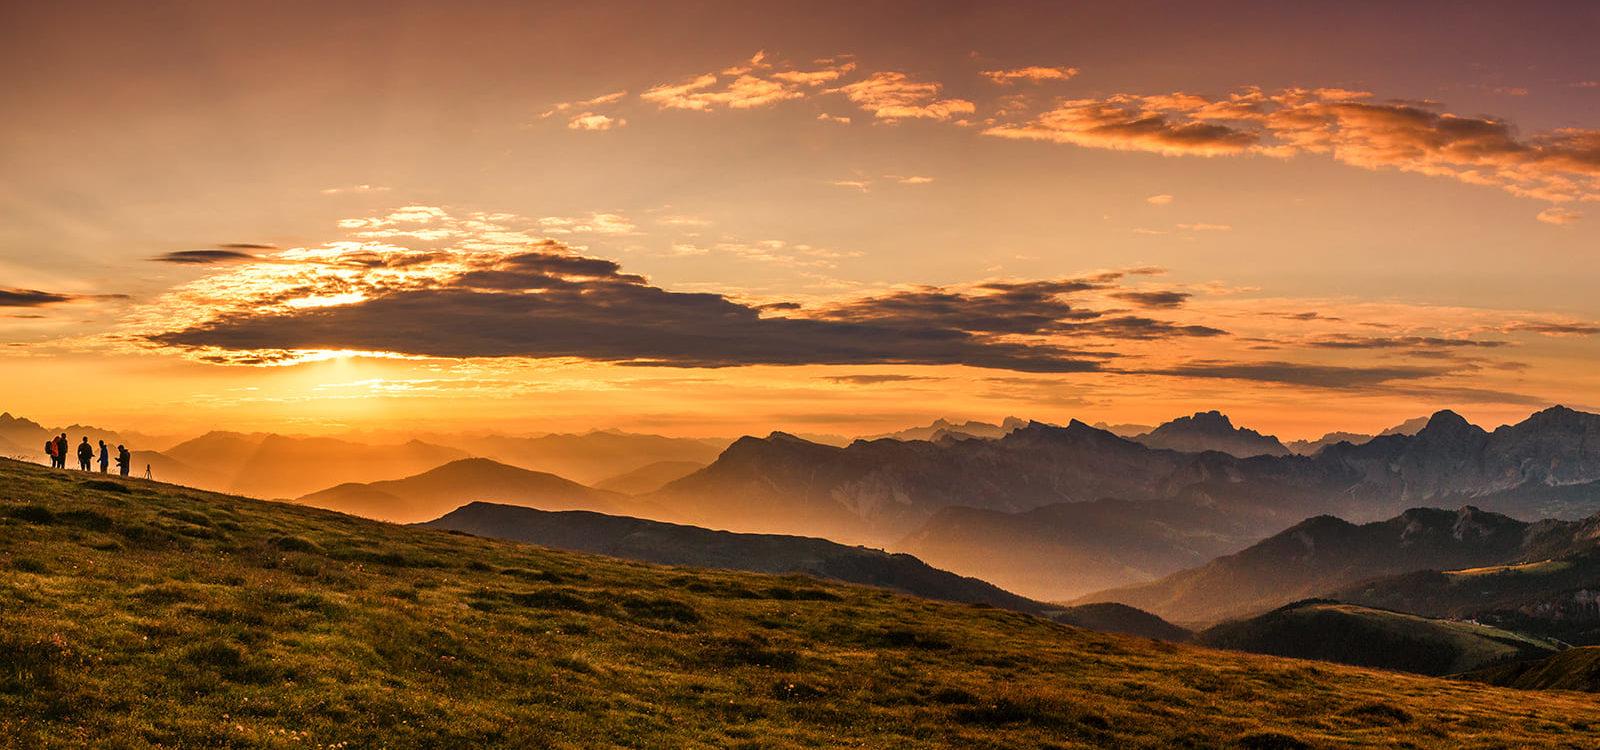 GERHARTS - Sonnenaufgang auf dem Gabler